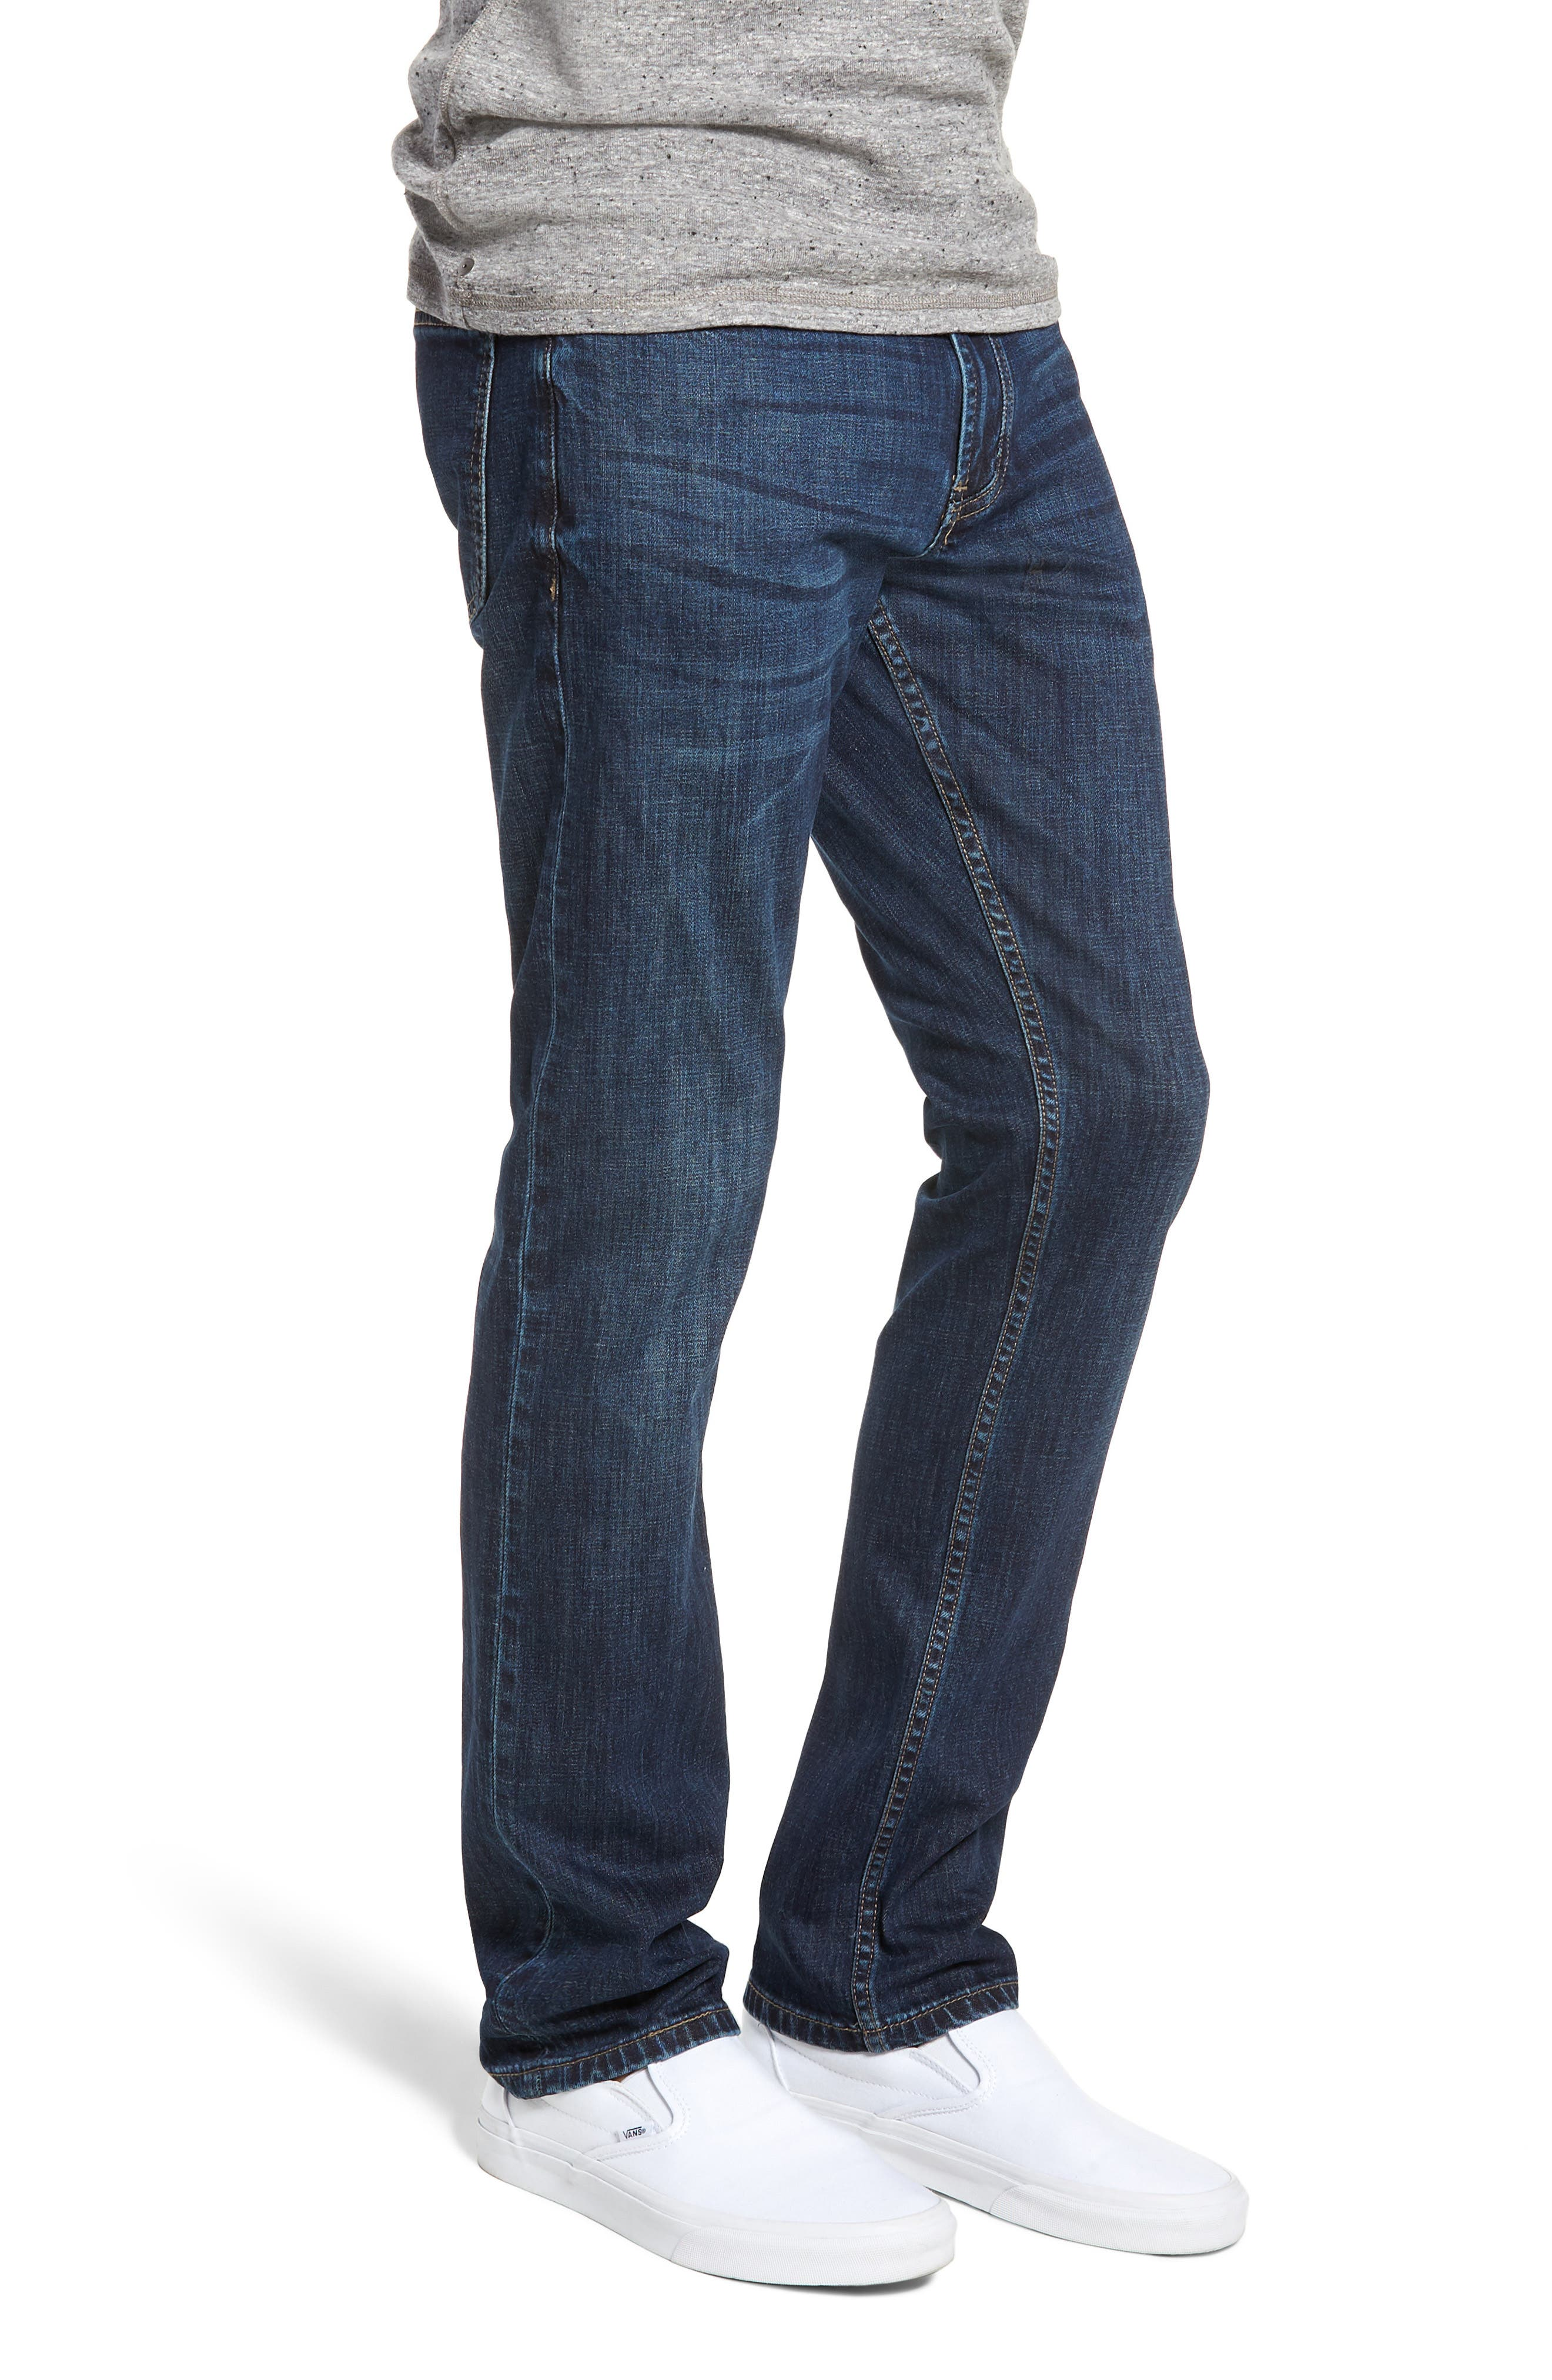 Wooster Slim Fit Jeans,                             Alternate thumbnail 3, color,                             THROTTLE THRUST